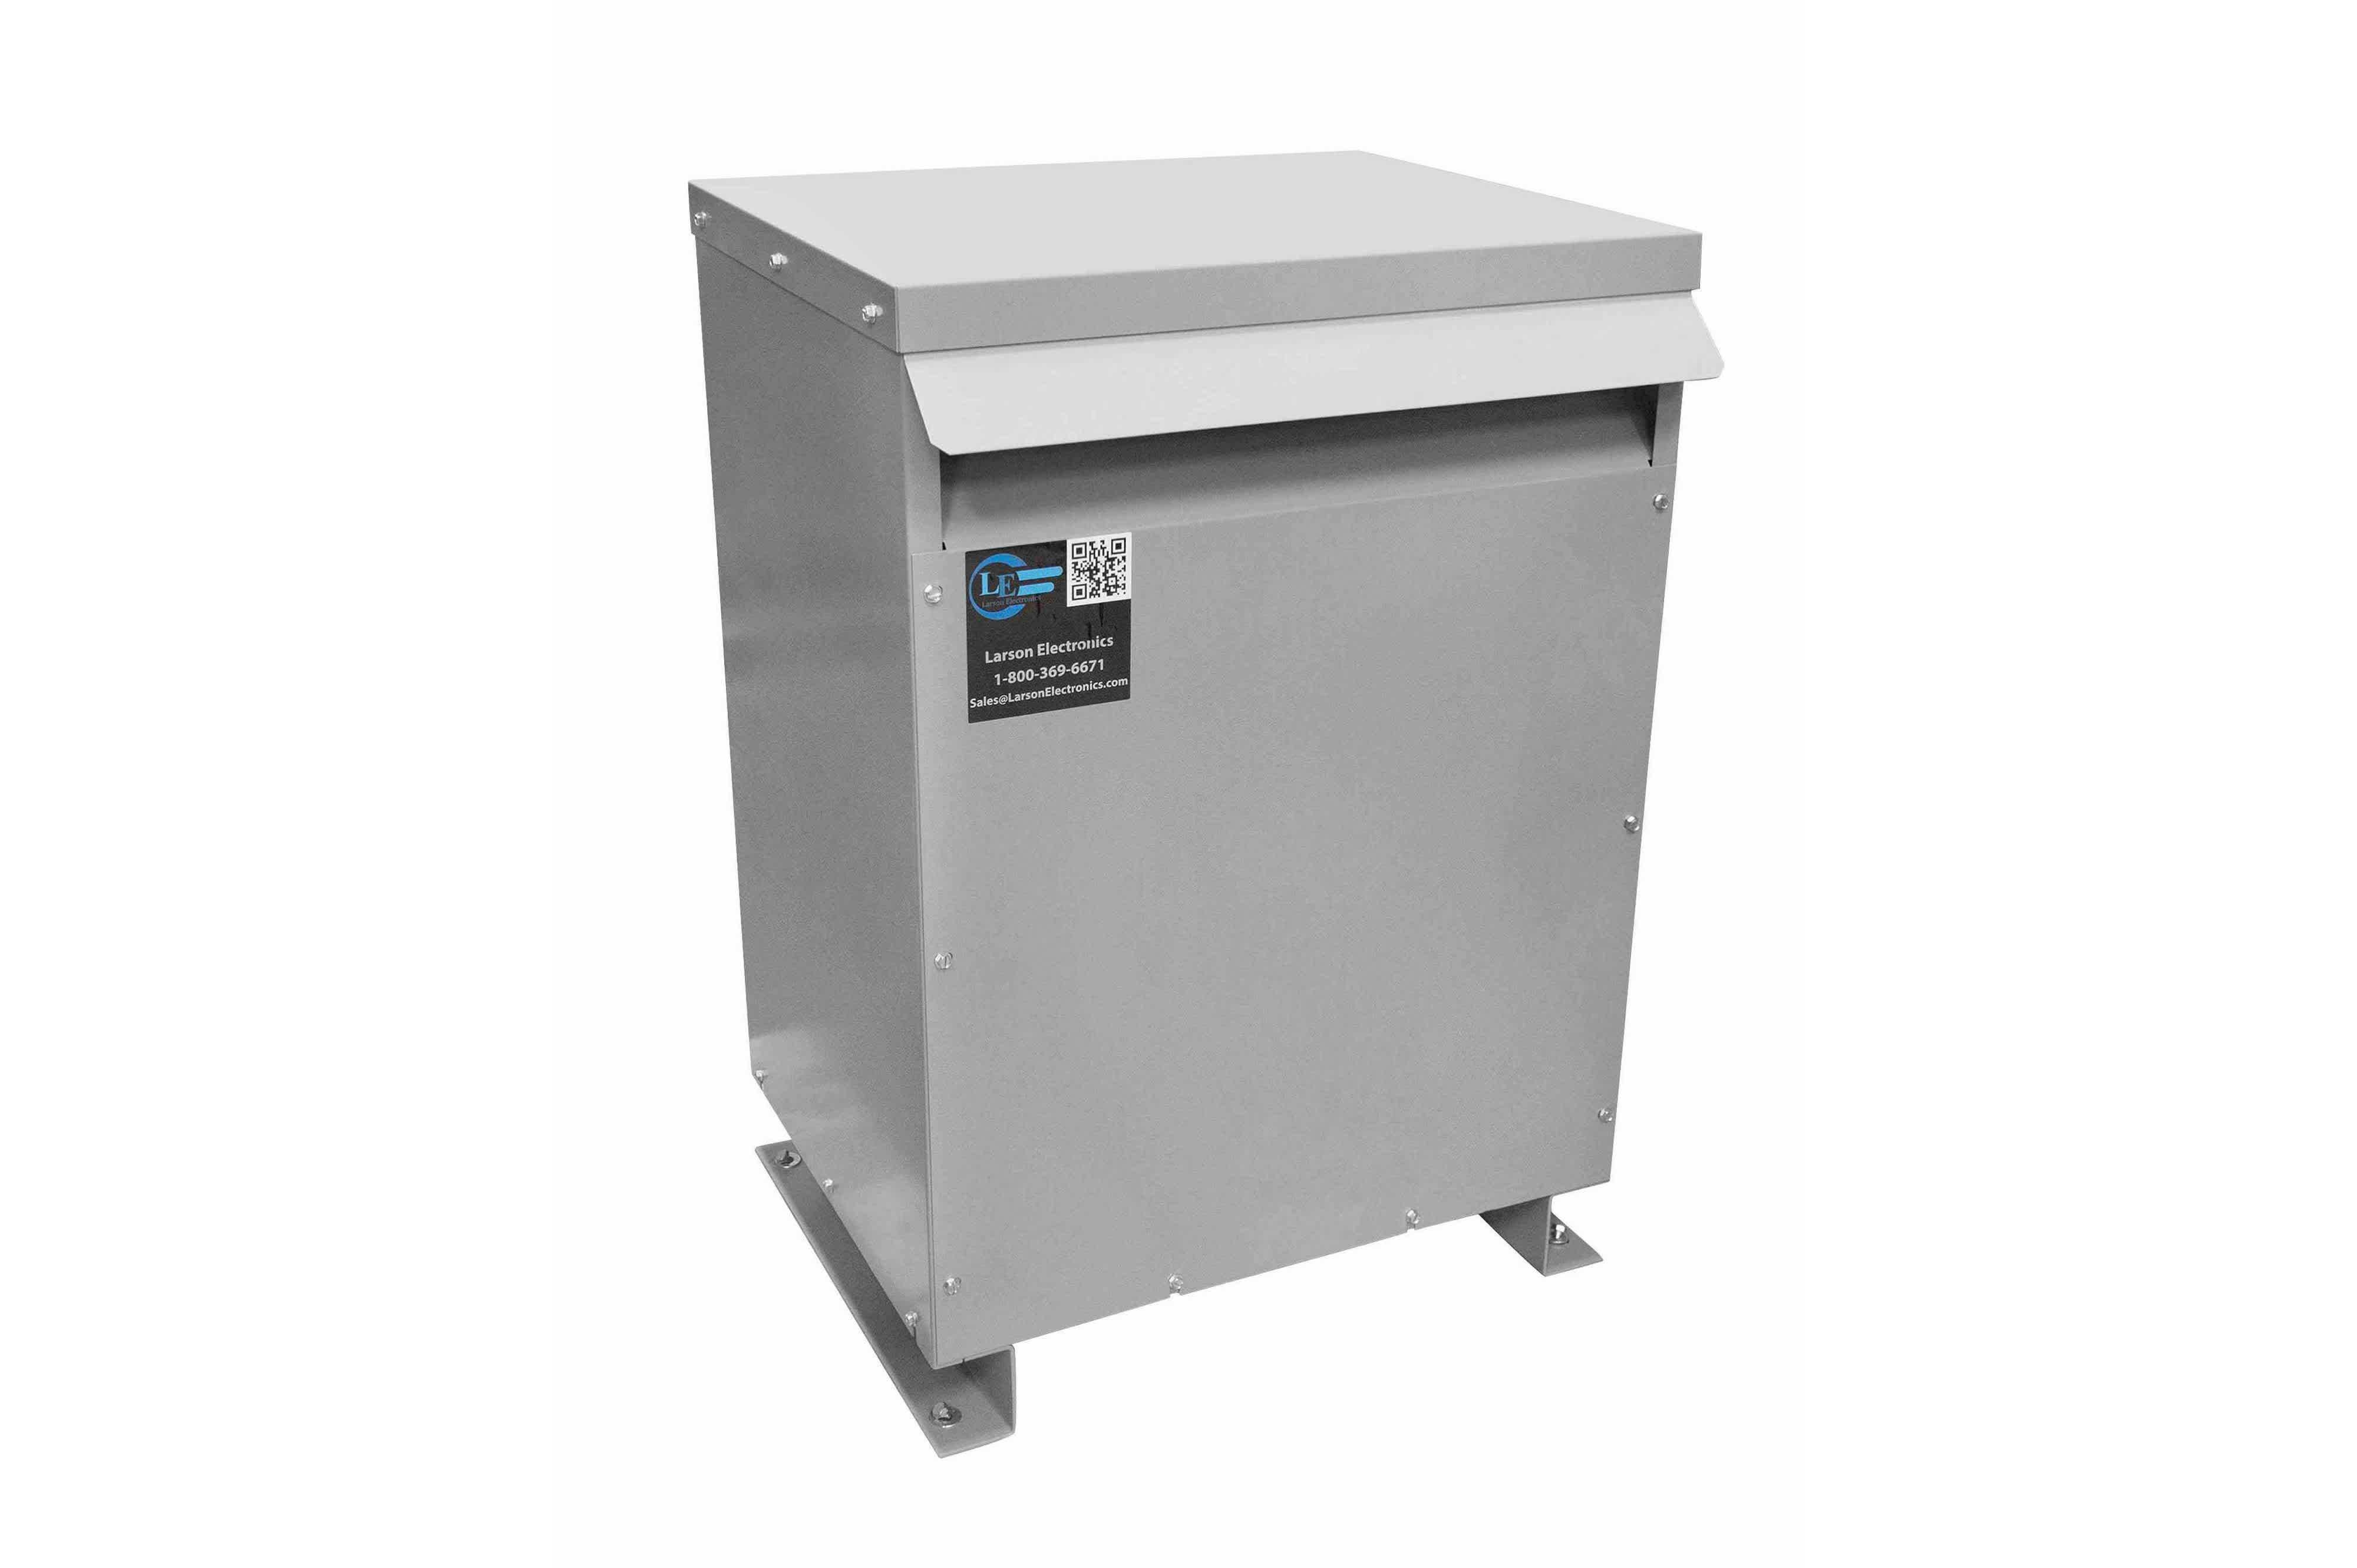 15 kVA 3PH DOE Transformer, 208V Delta Primary, 380Y/220 Wye-N Secondary, N3R, Ventilated, 60 Hz